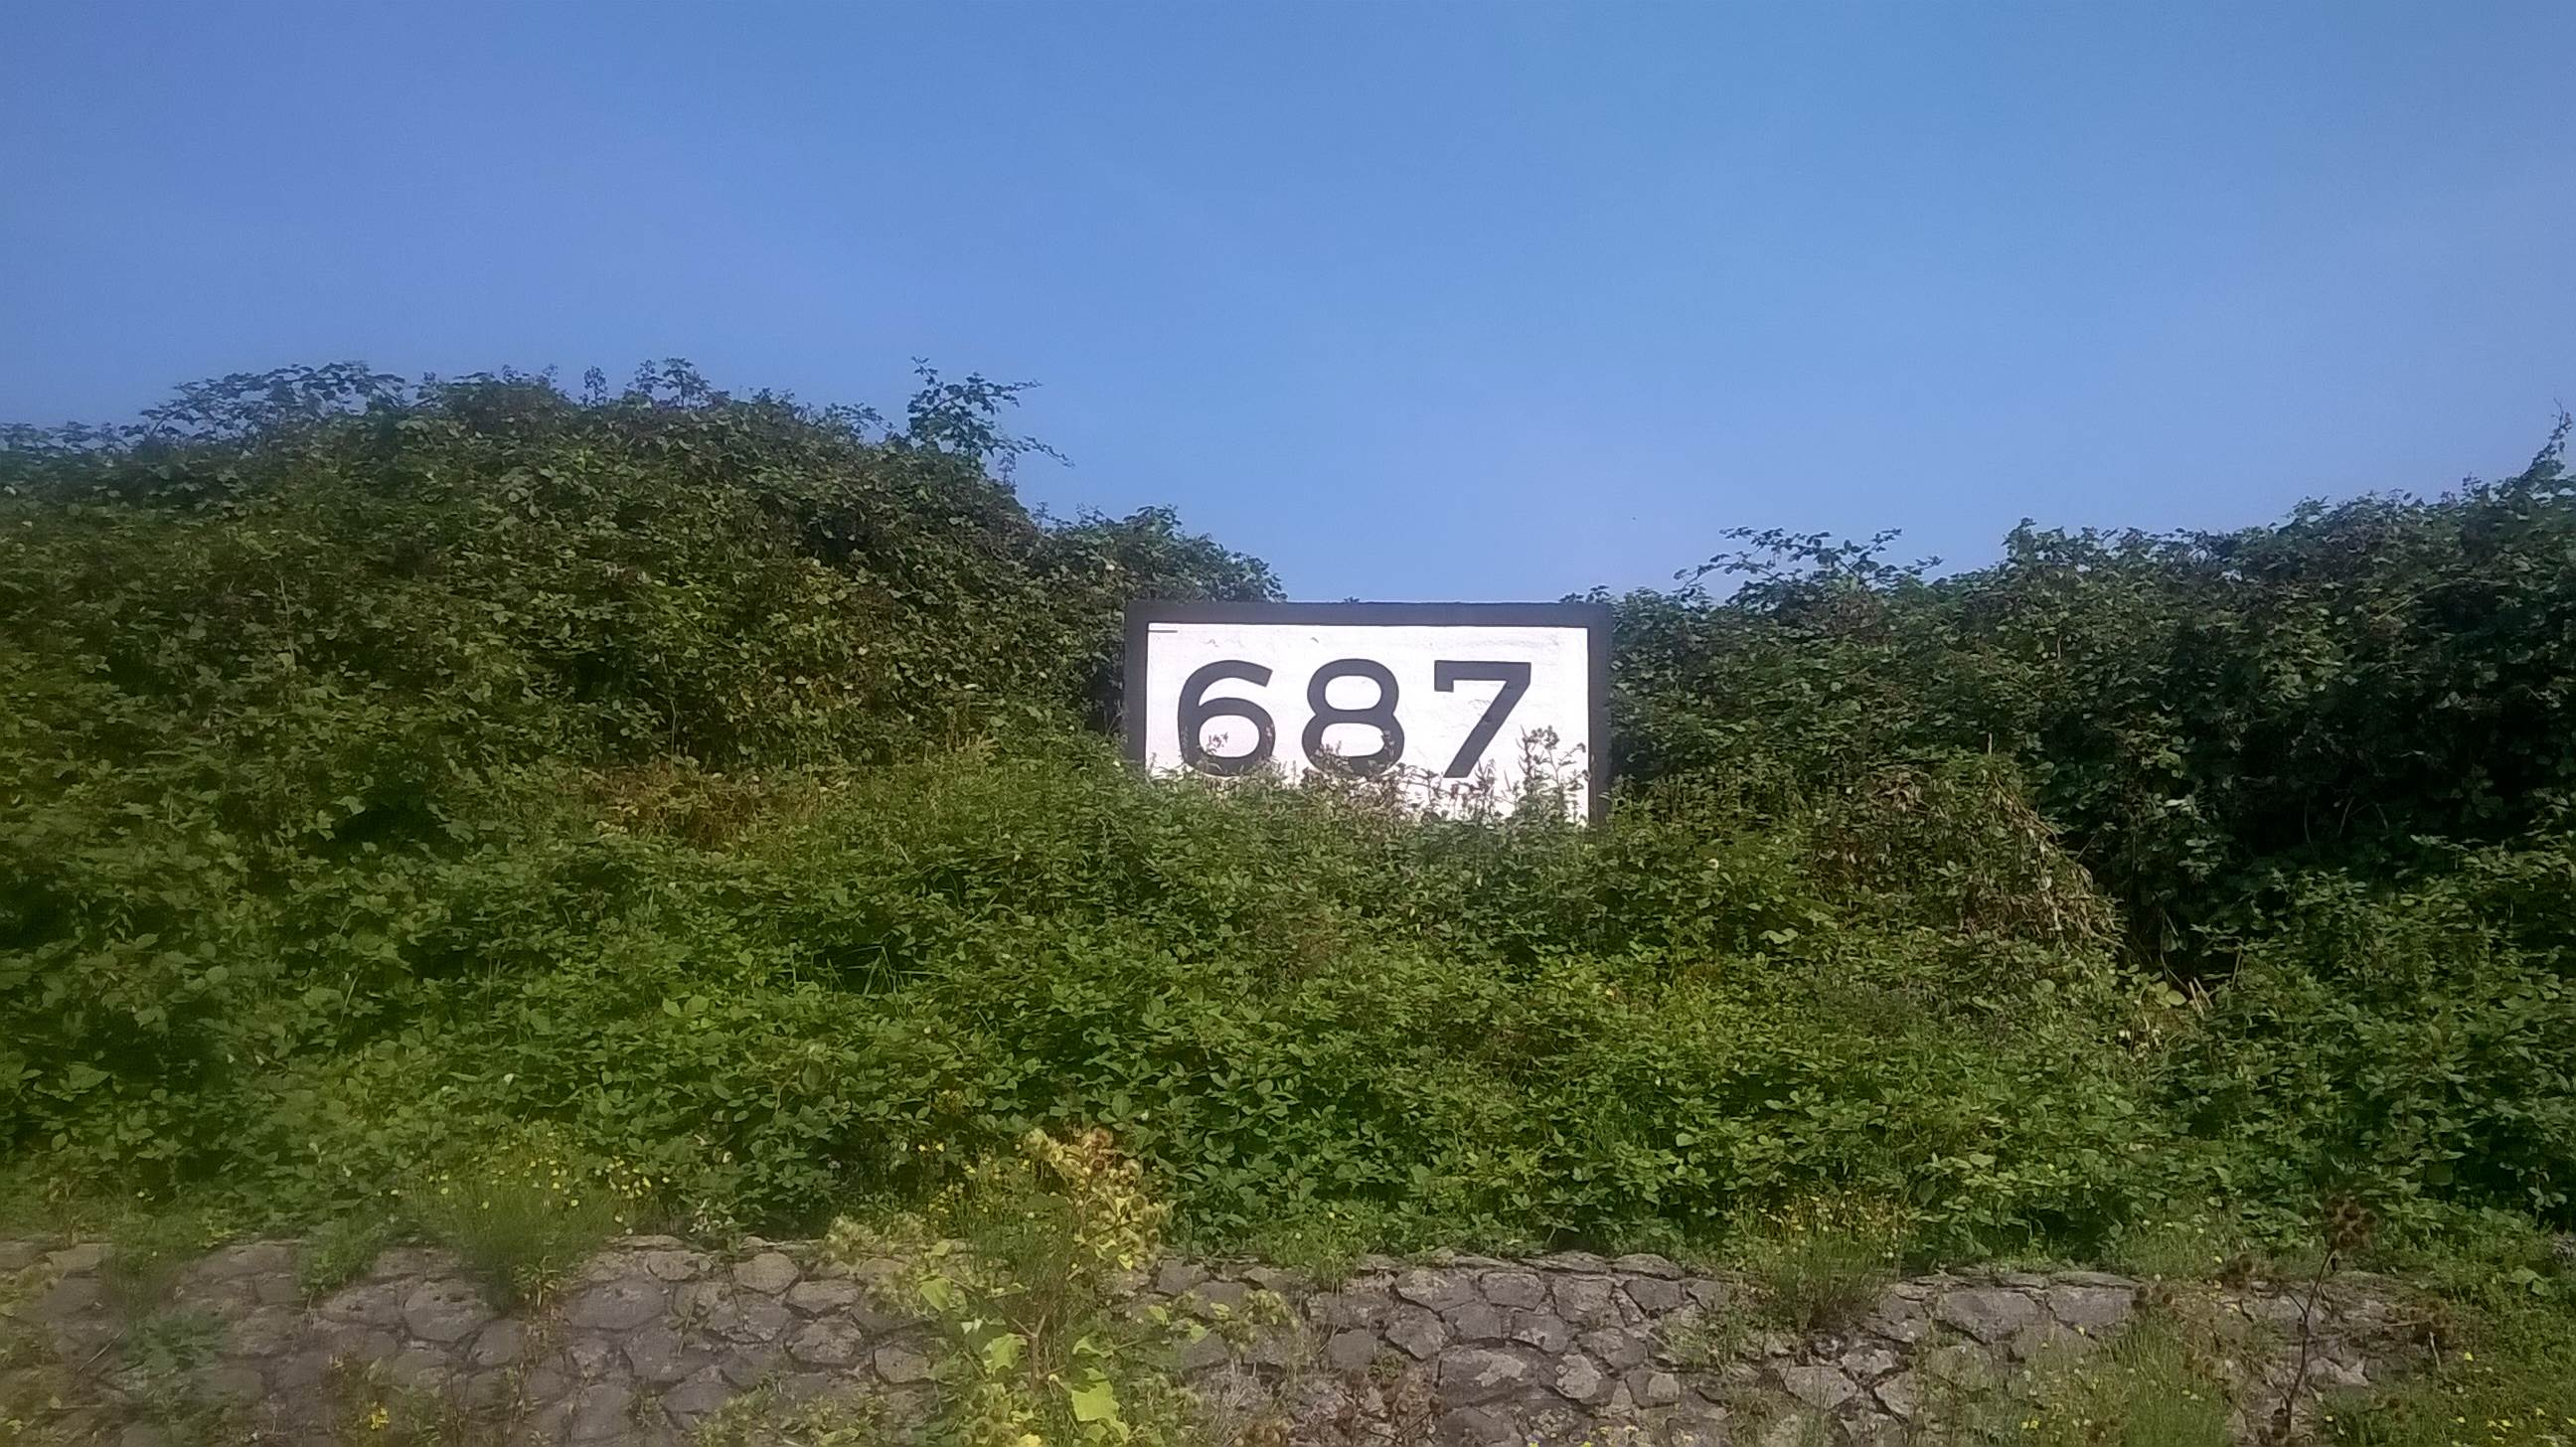 rheinkilometer-687